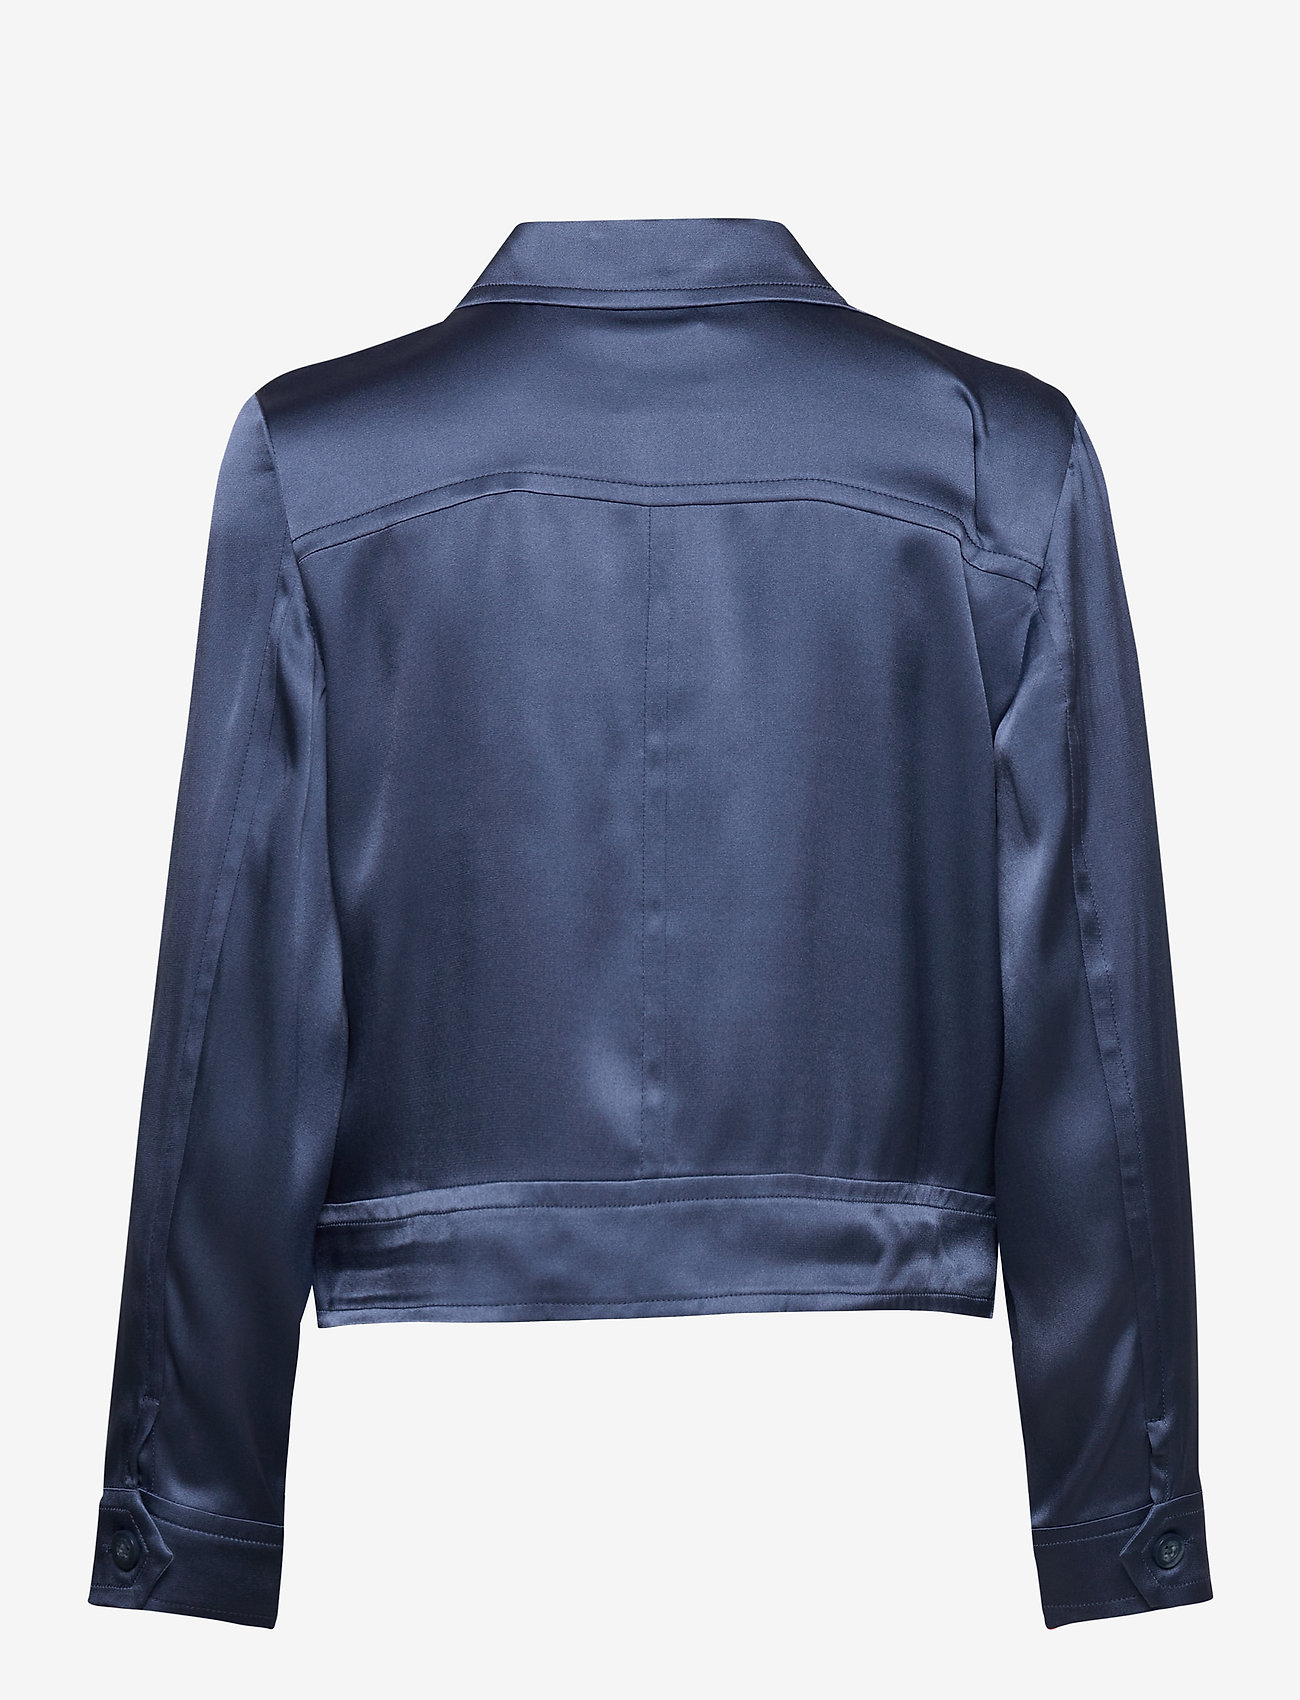 SAND - Double Silk - Kaela - lichte jassen - medium blue - 1